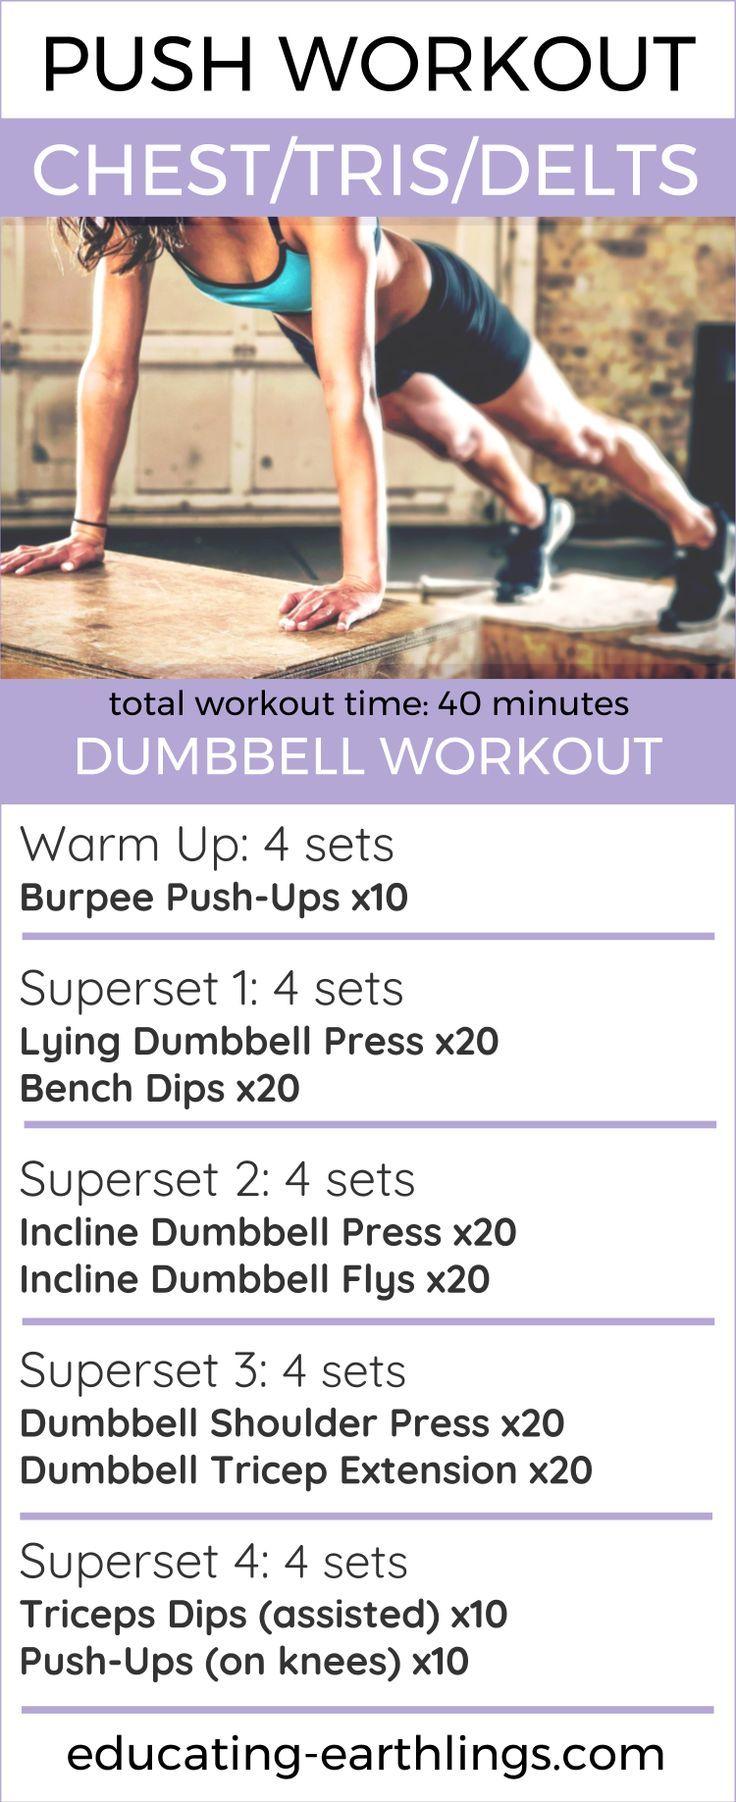 Push Workout: Push-Pull-Leg Split | Upper Body - Workout and